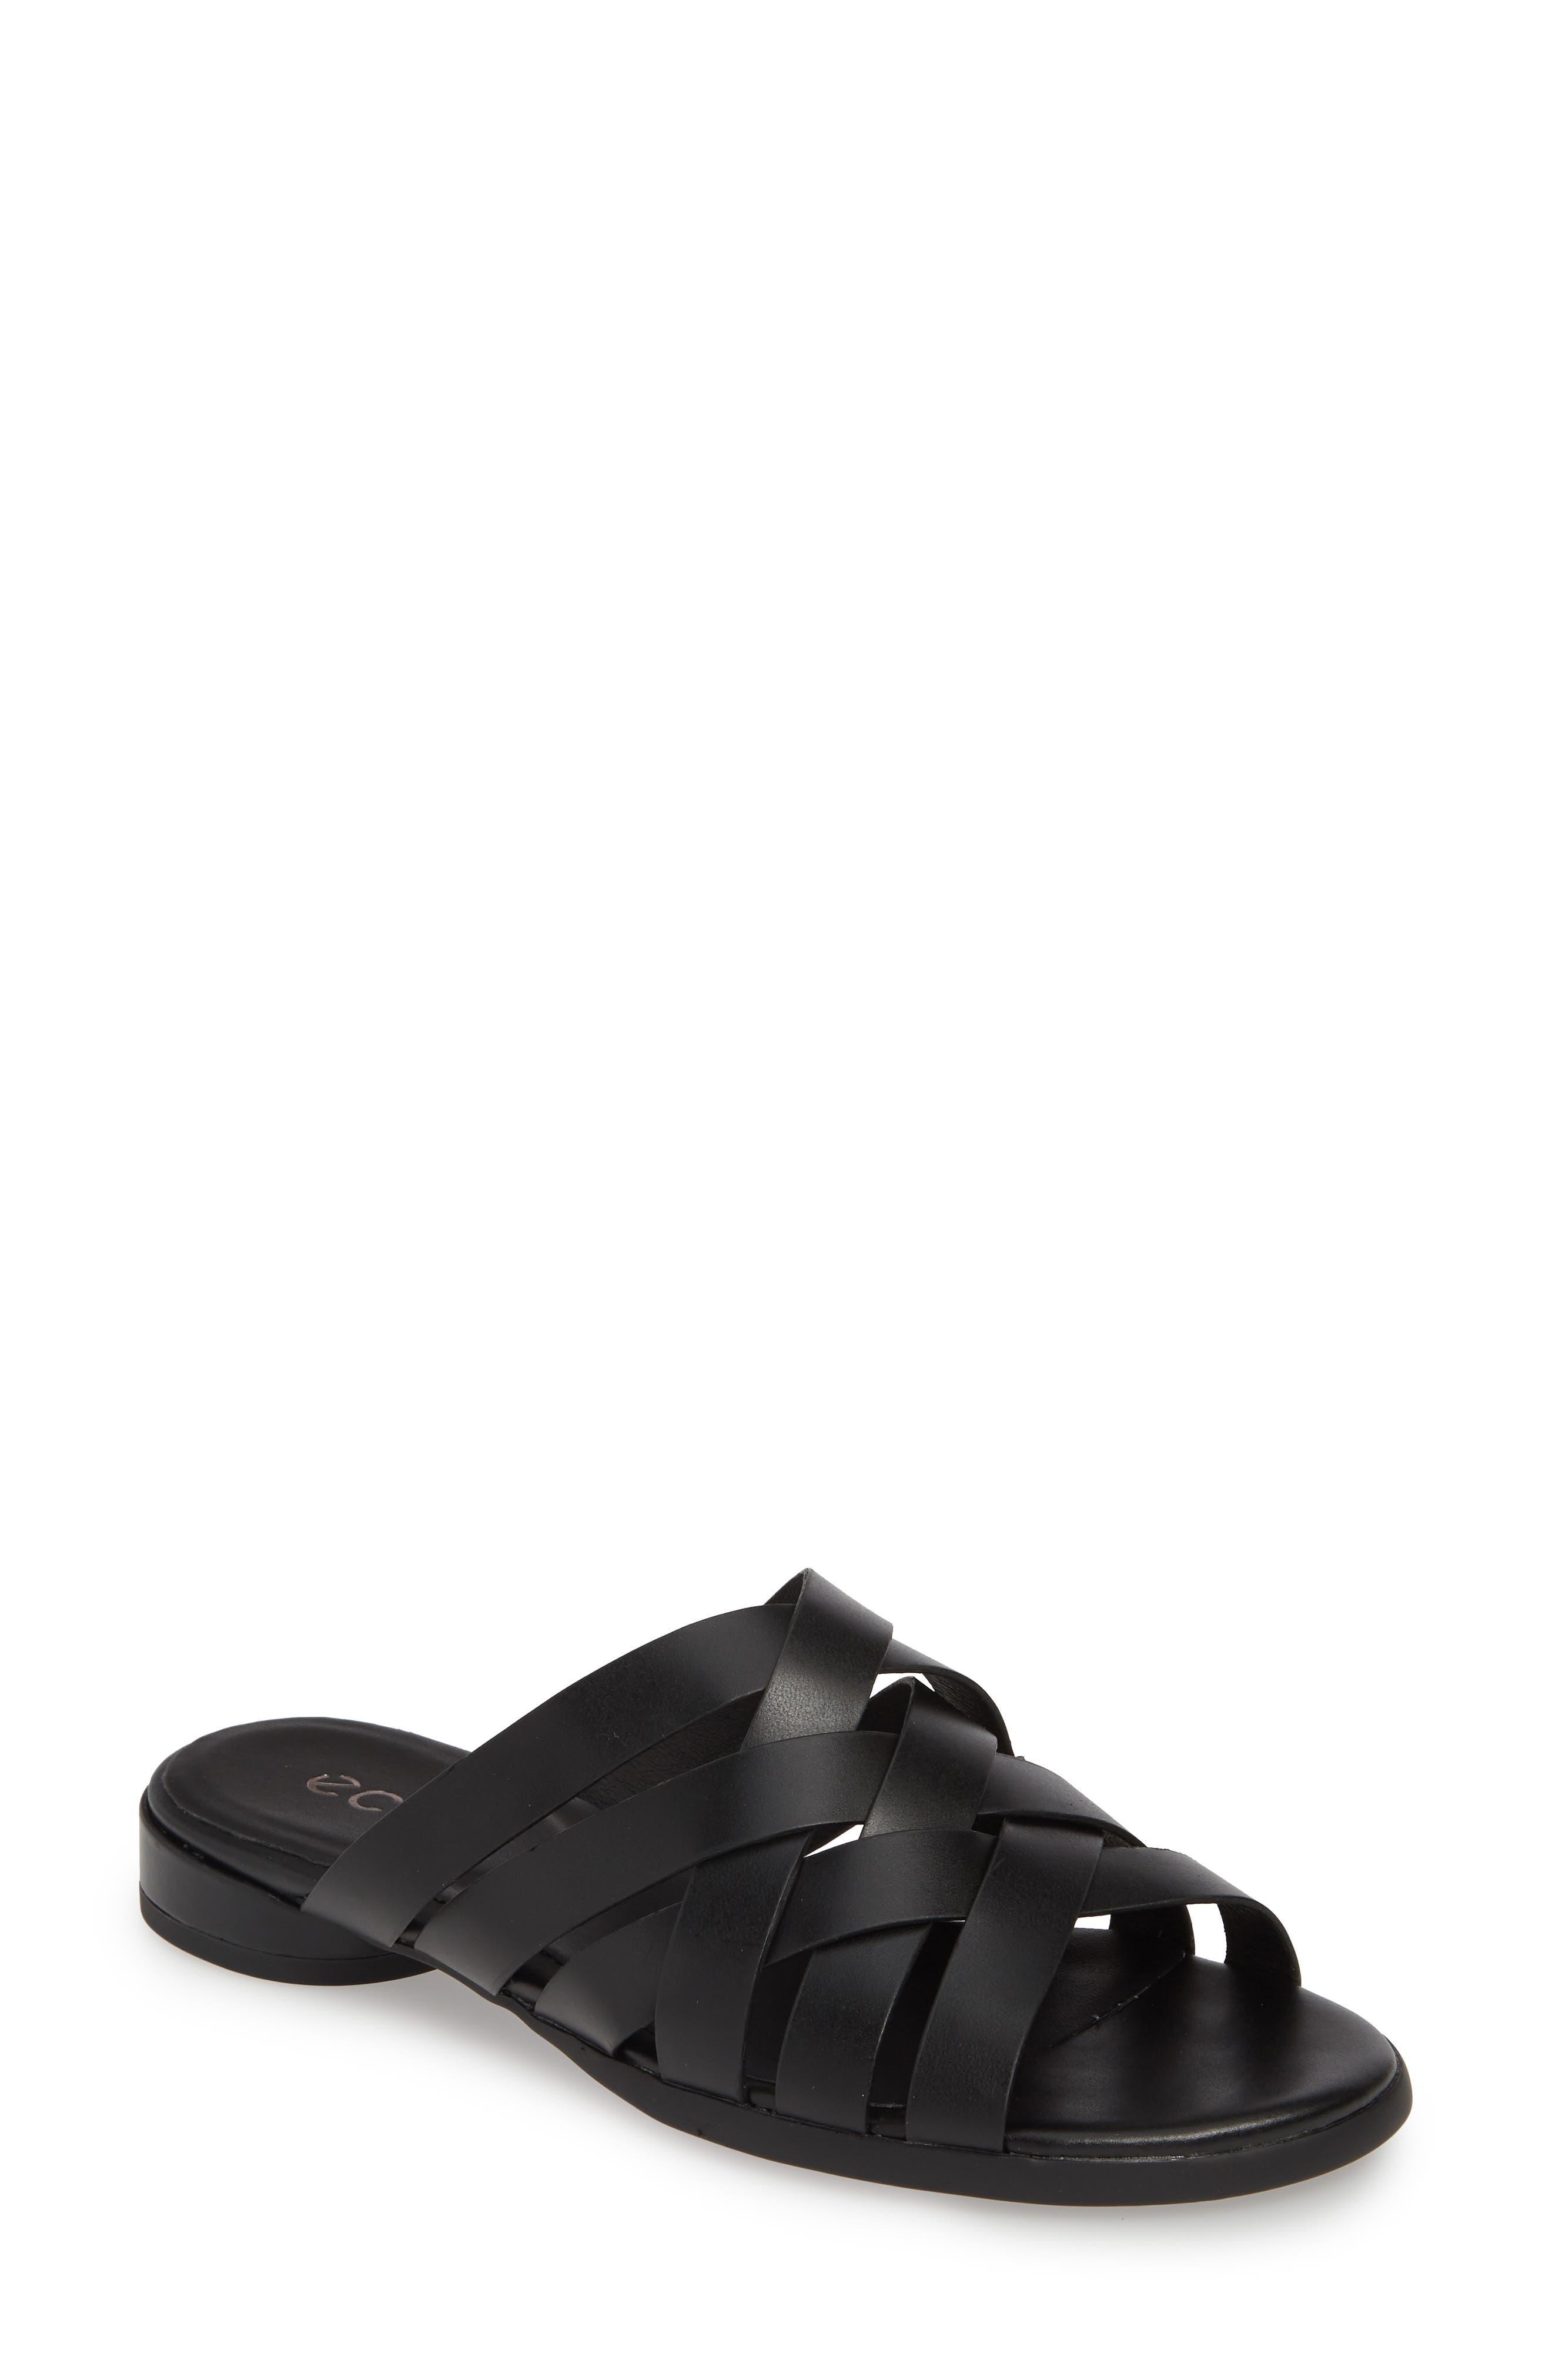 Women's Ecco Strappy Slide Sandal